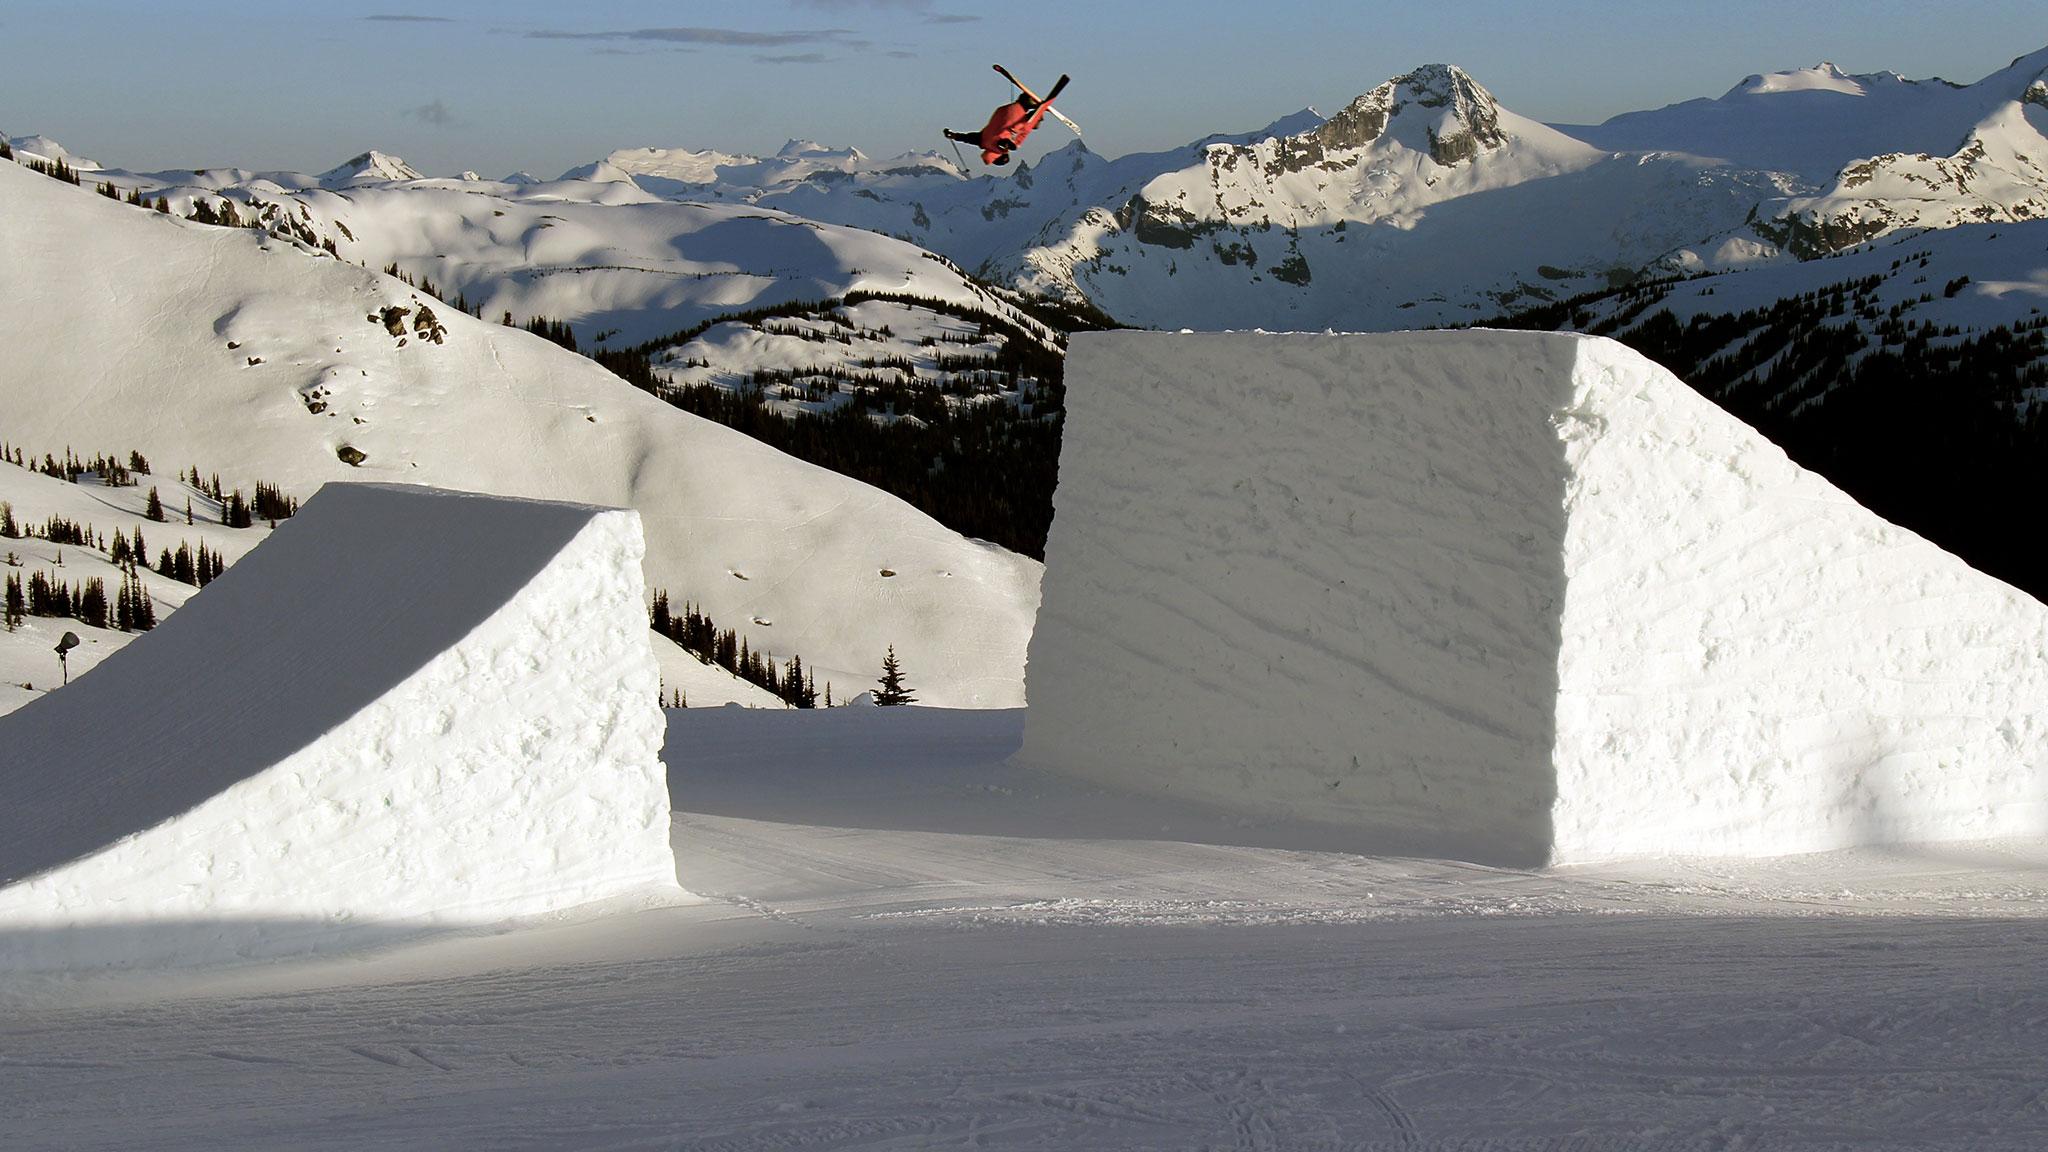 Whistler/Blackcomb, BC